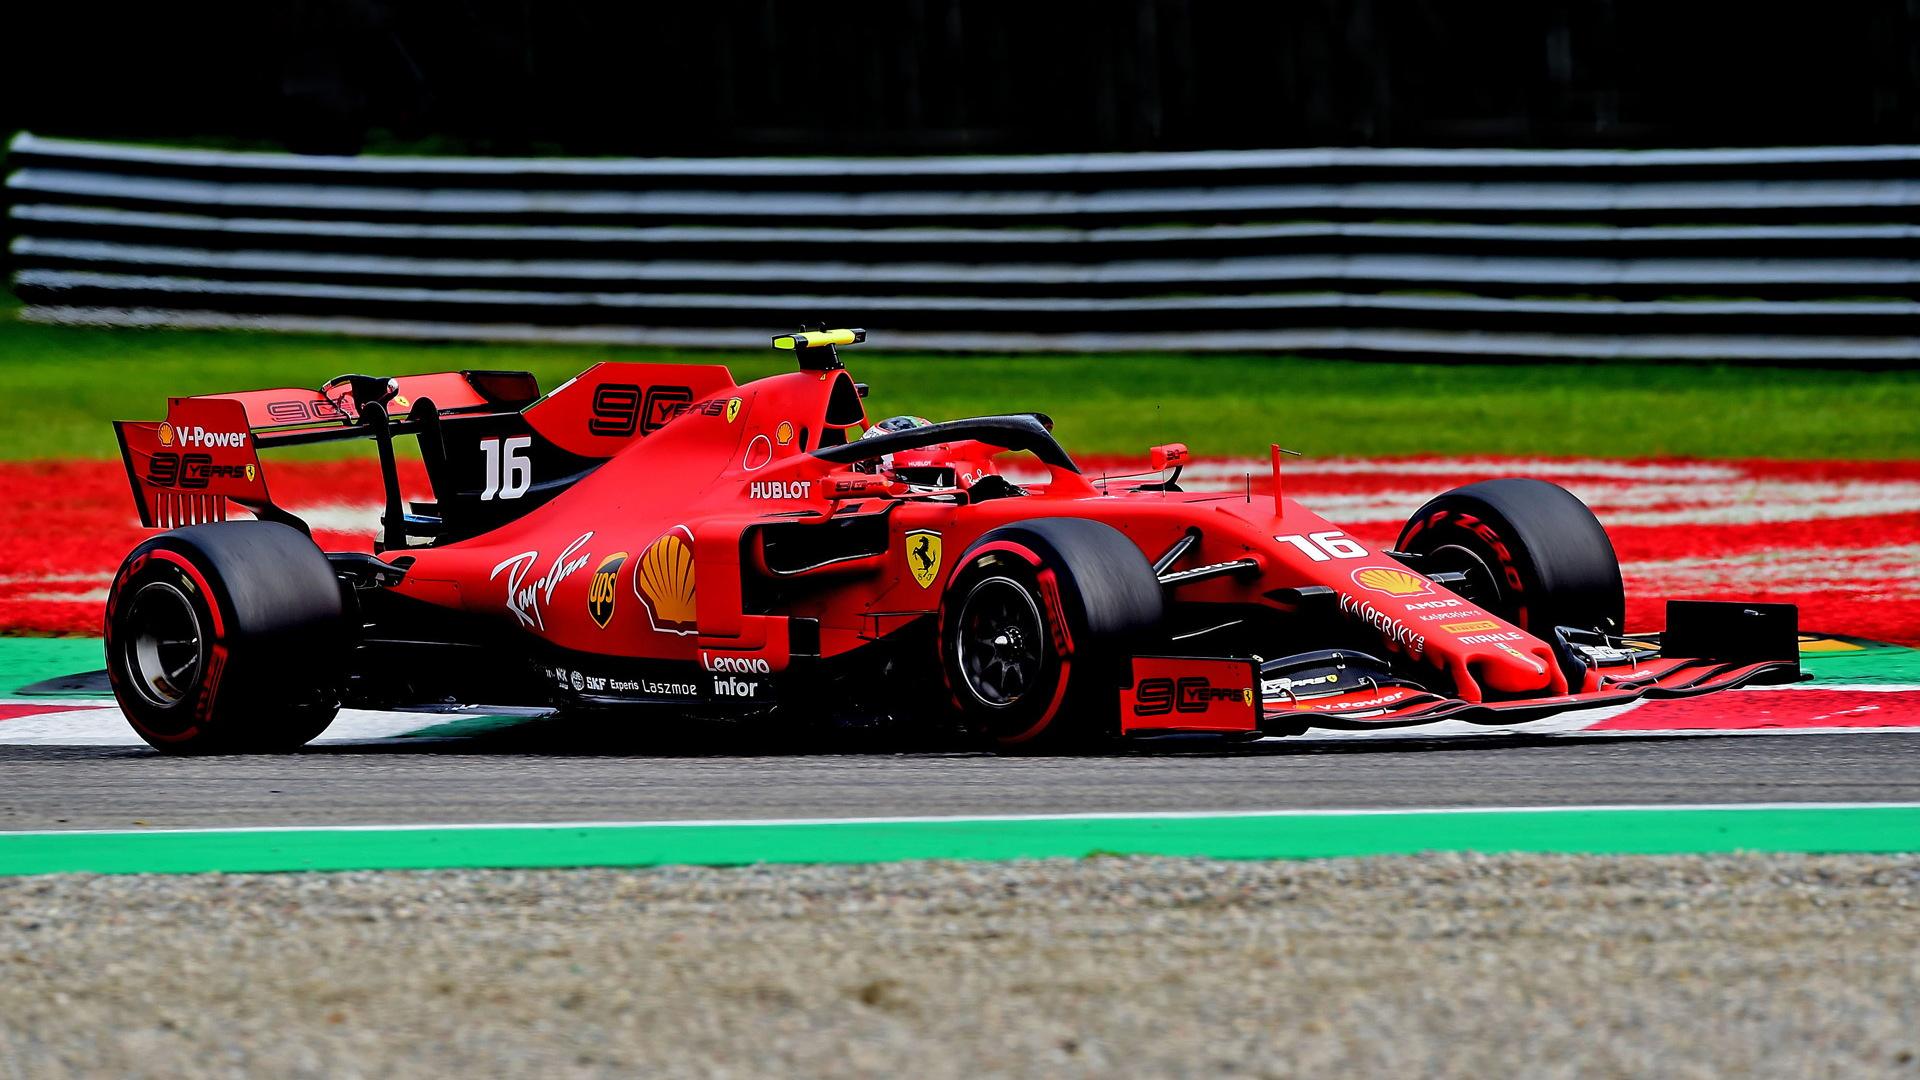 Ferrari's Charles Leclerc at the 2019 Formula One Italian Grand Prix